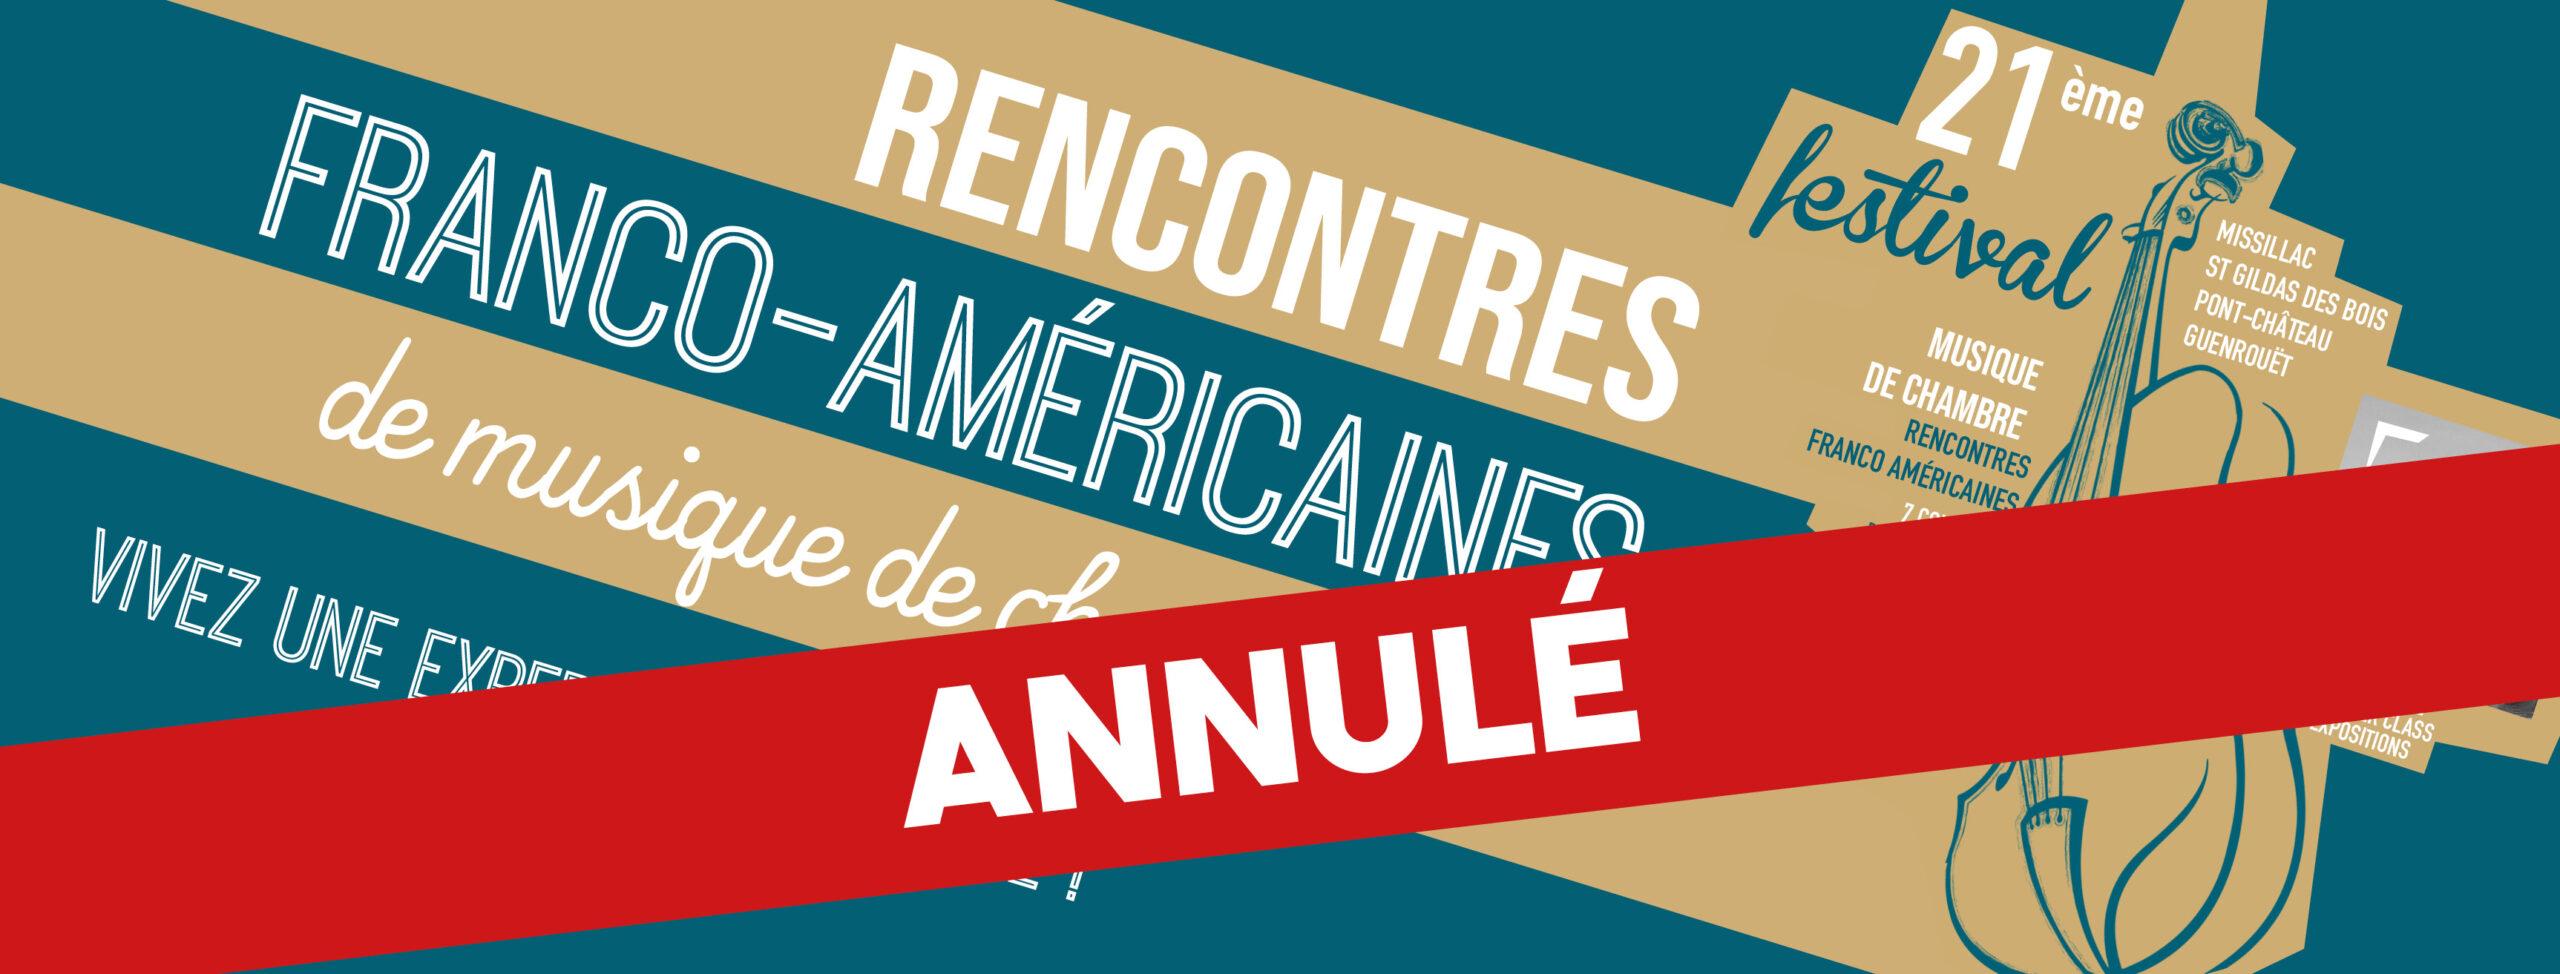 rencontres franco américaines)